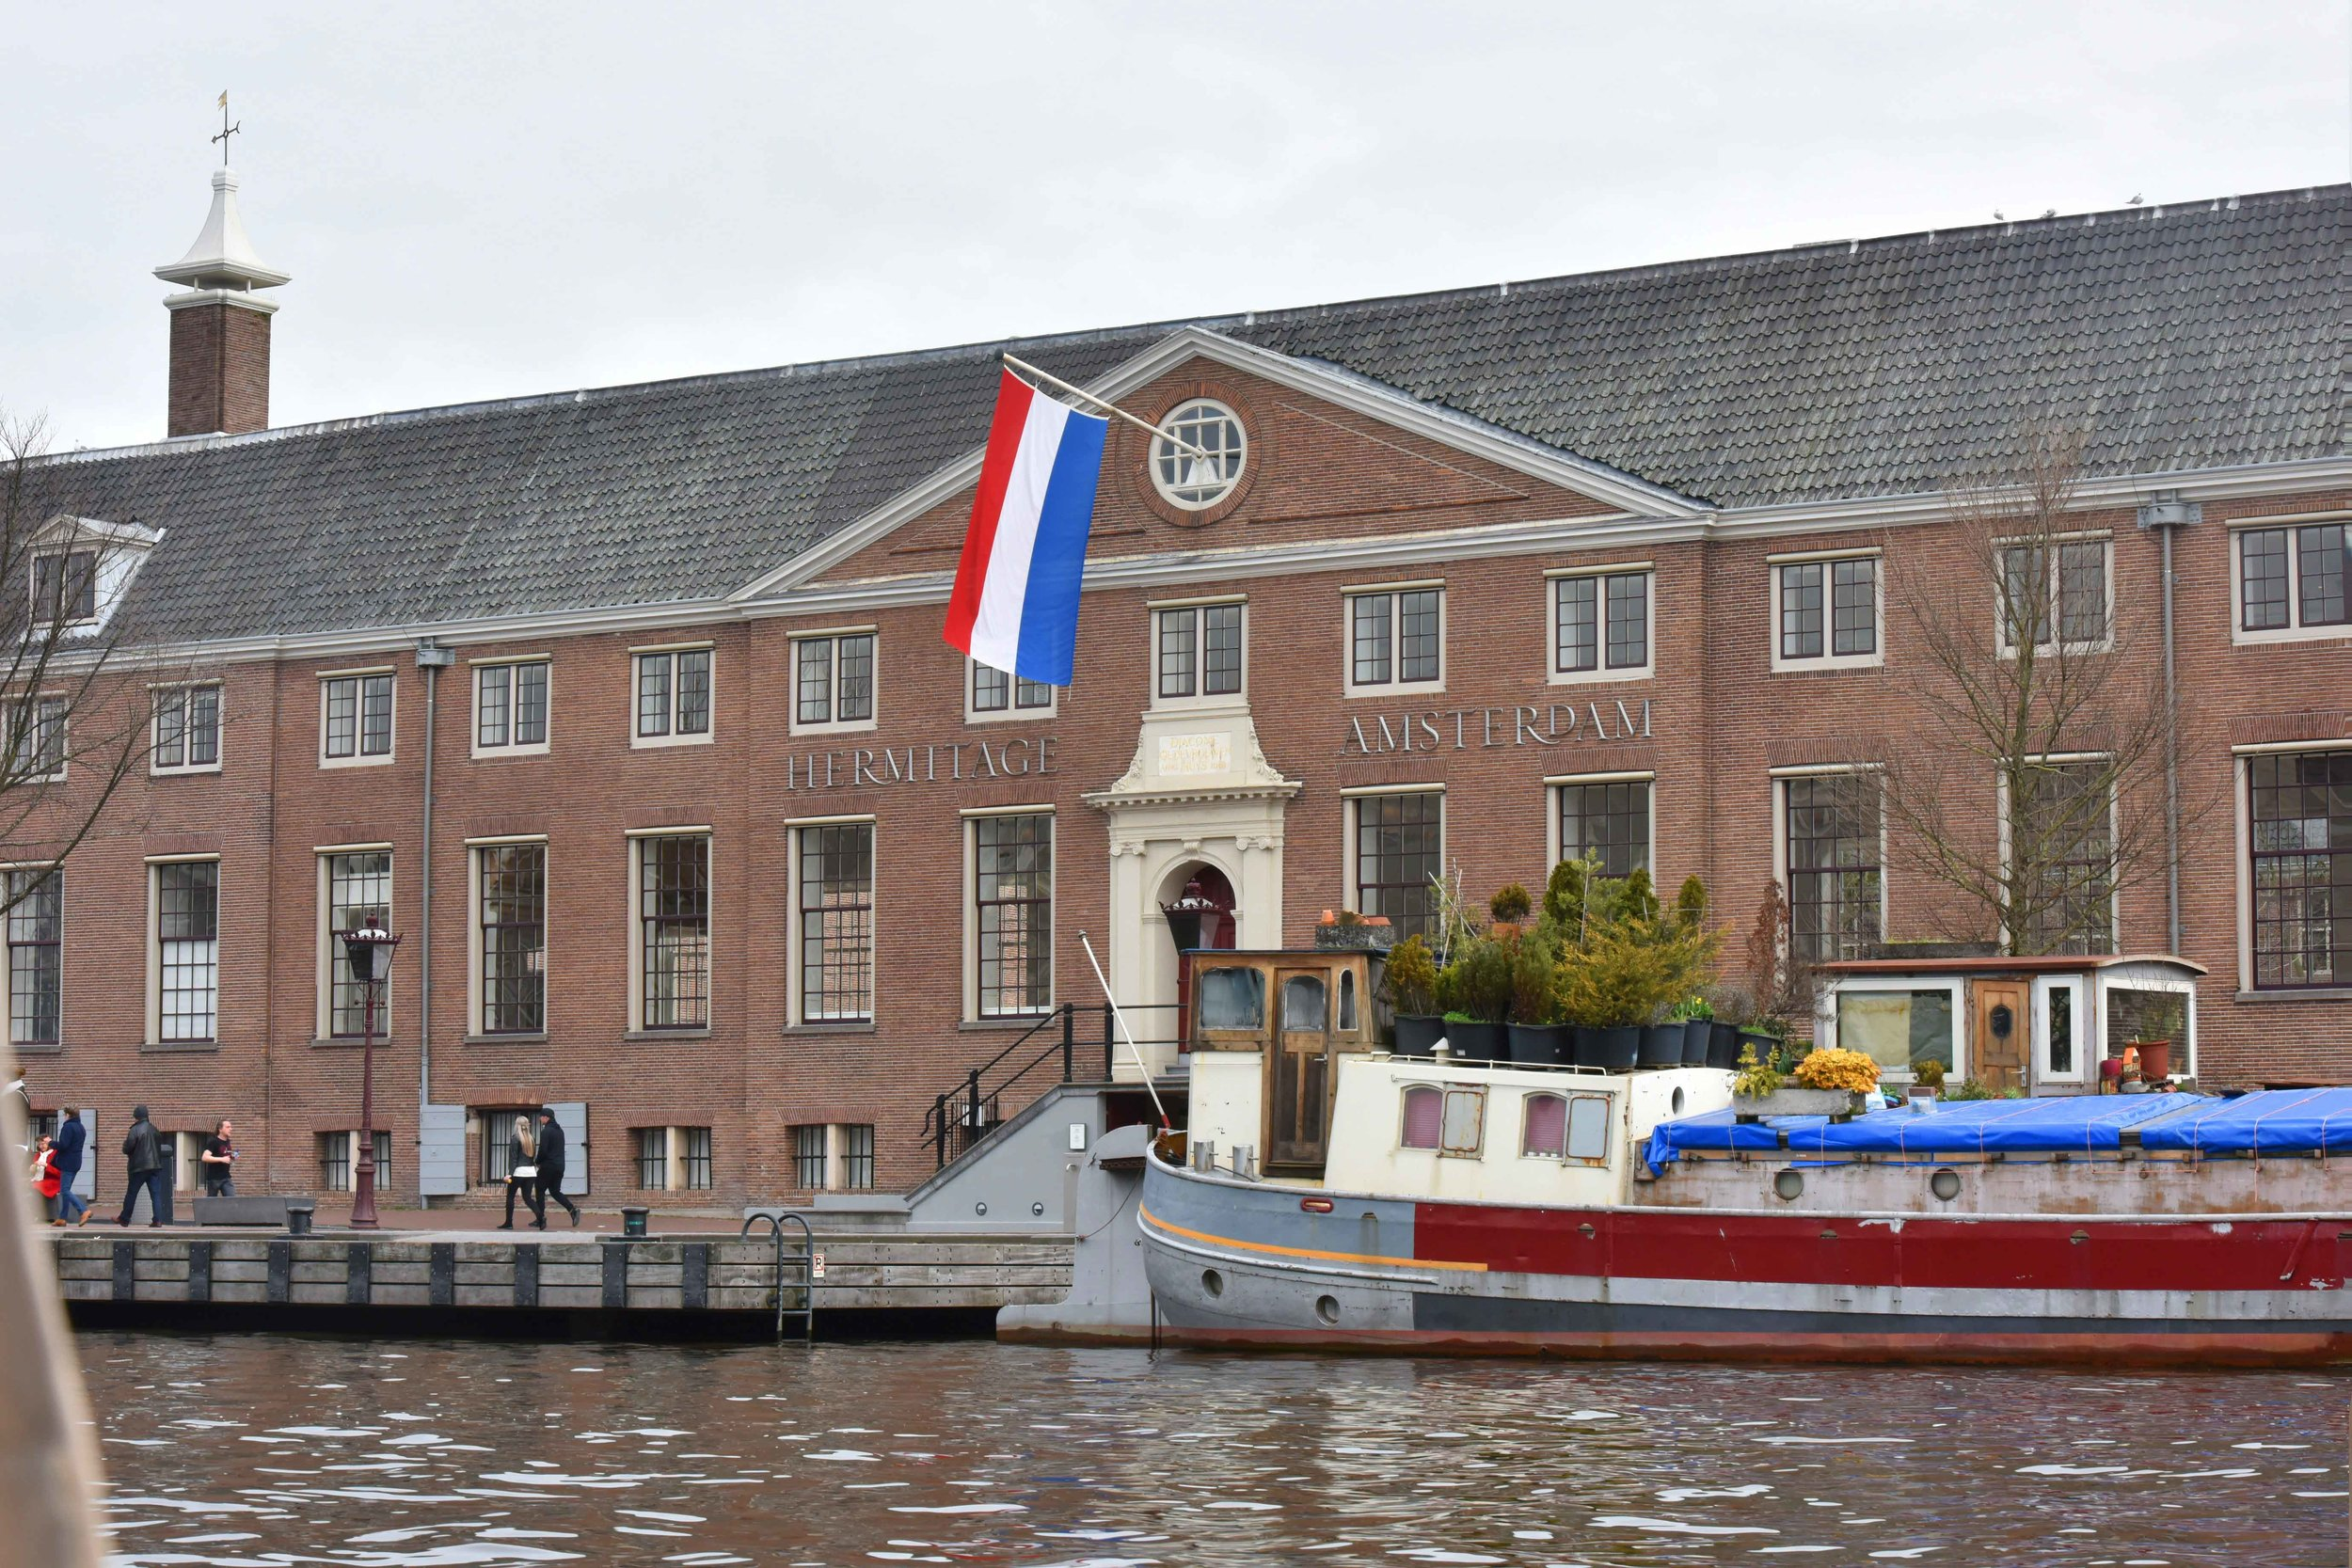 The Hermitage,Amsterdam. Image©thingstodot.com